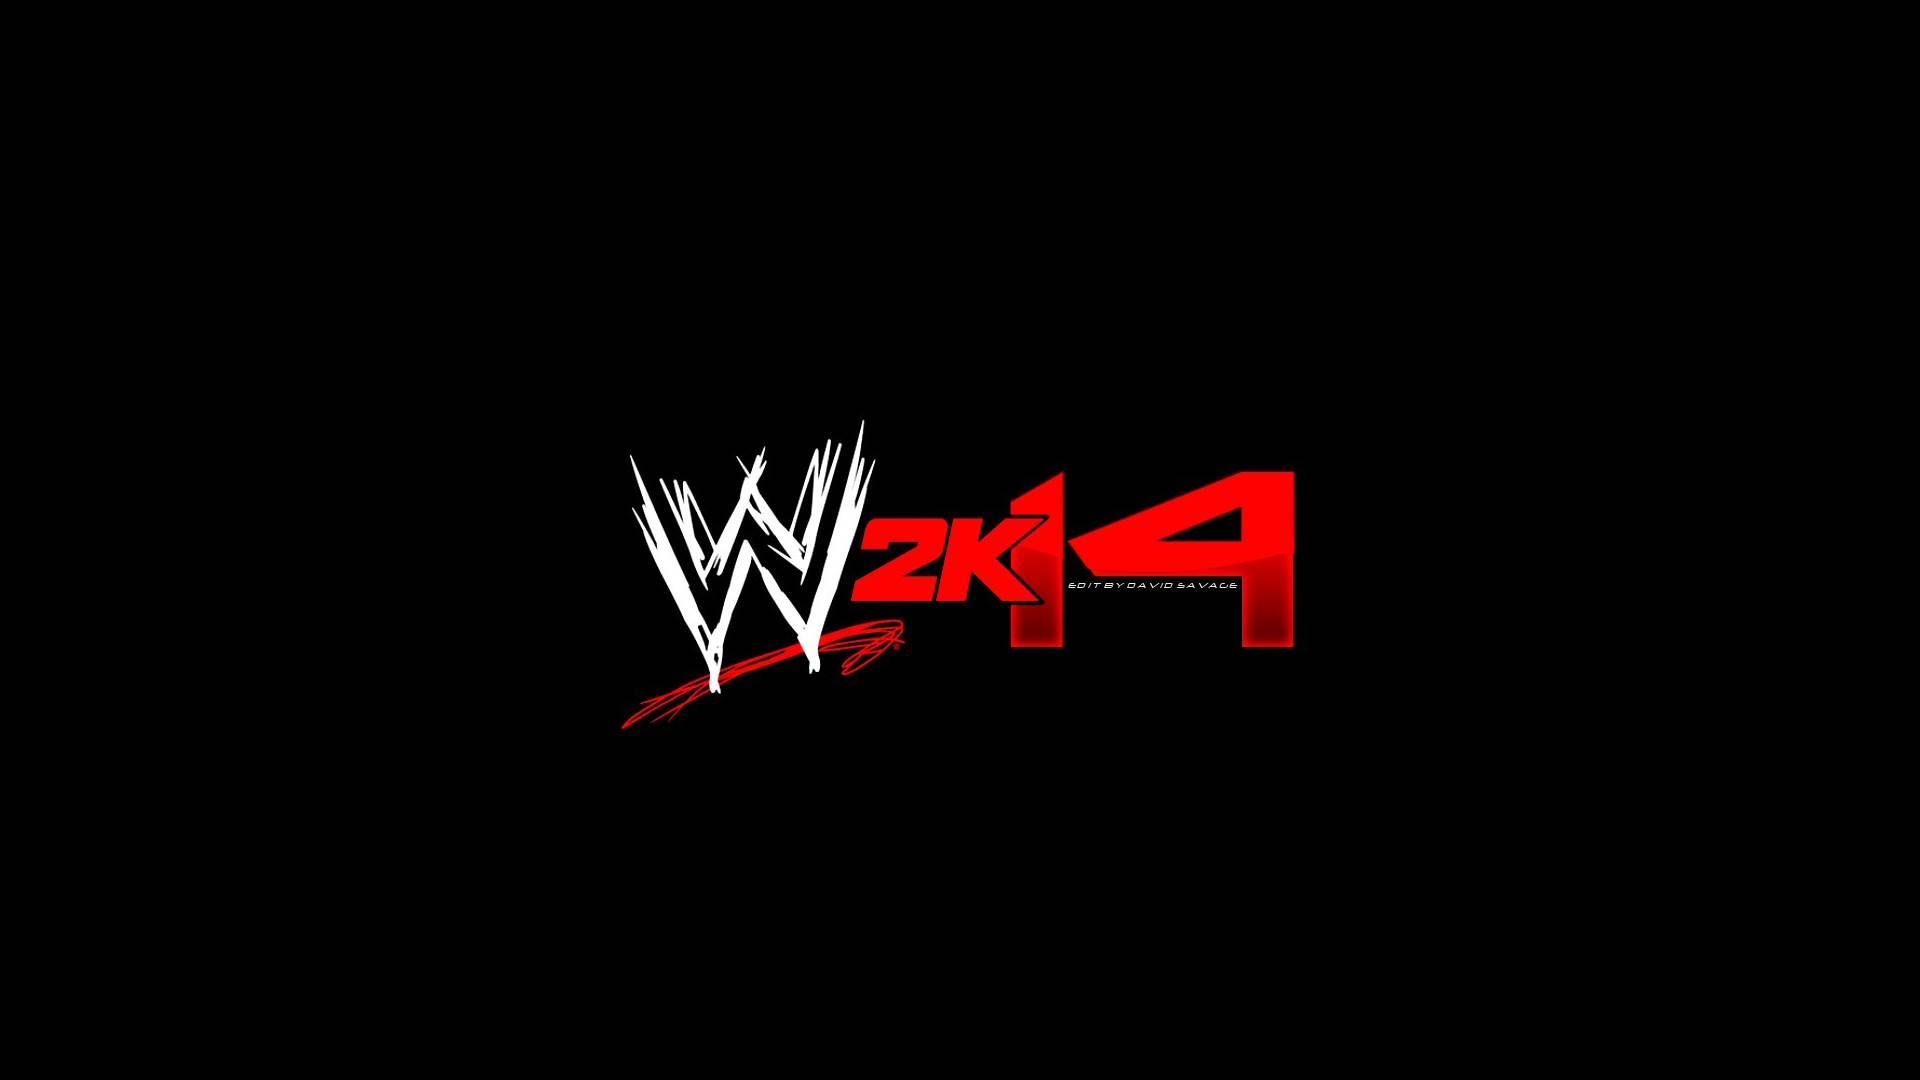 49+ WWE iPhone Wallpaper on WallpaperSafari